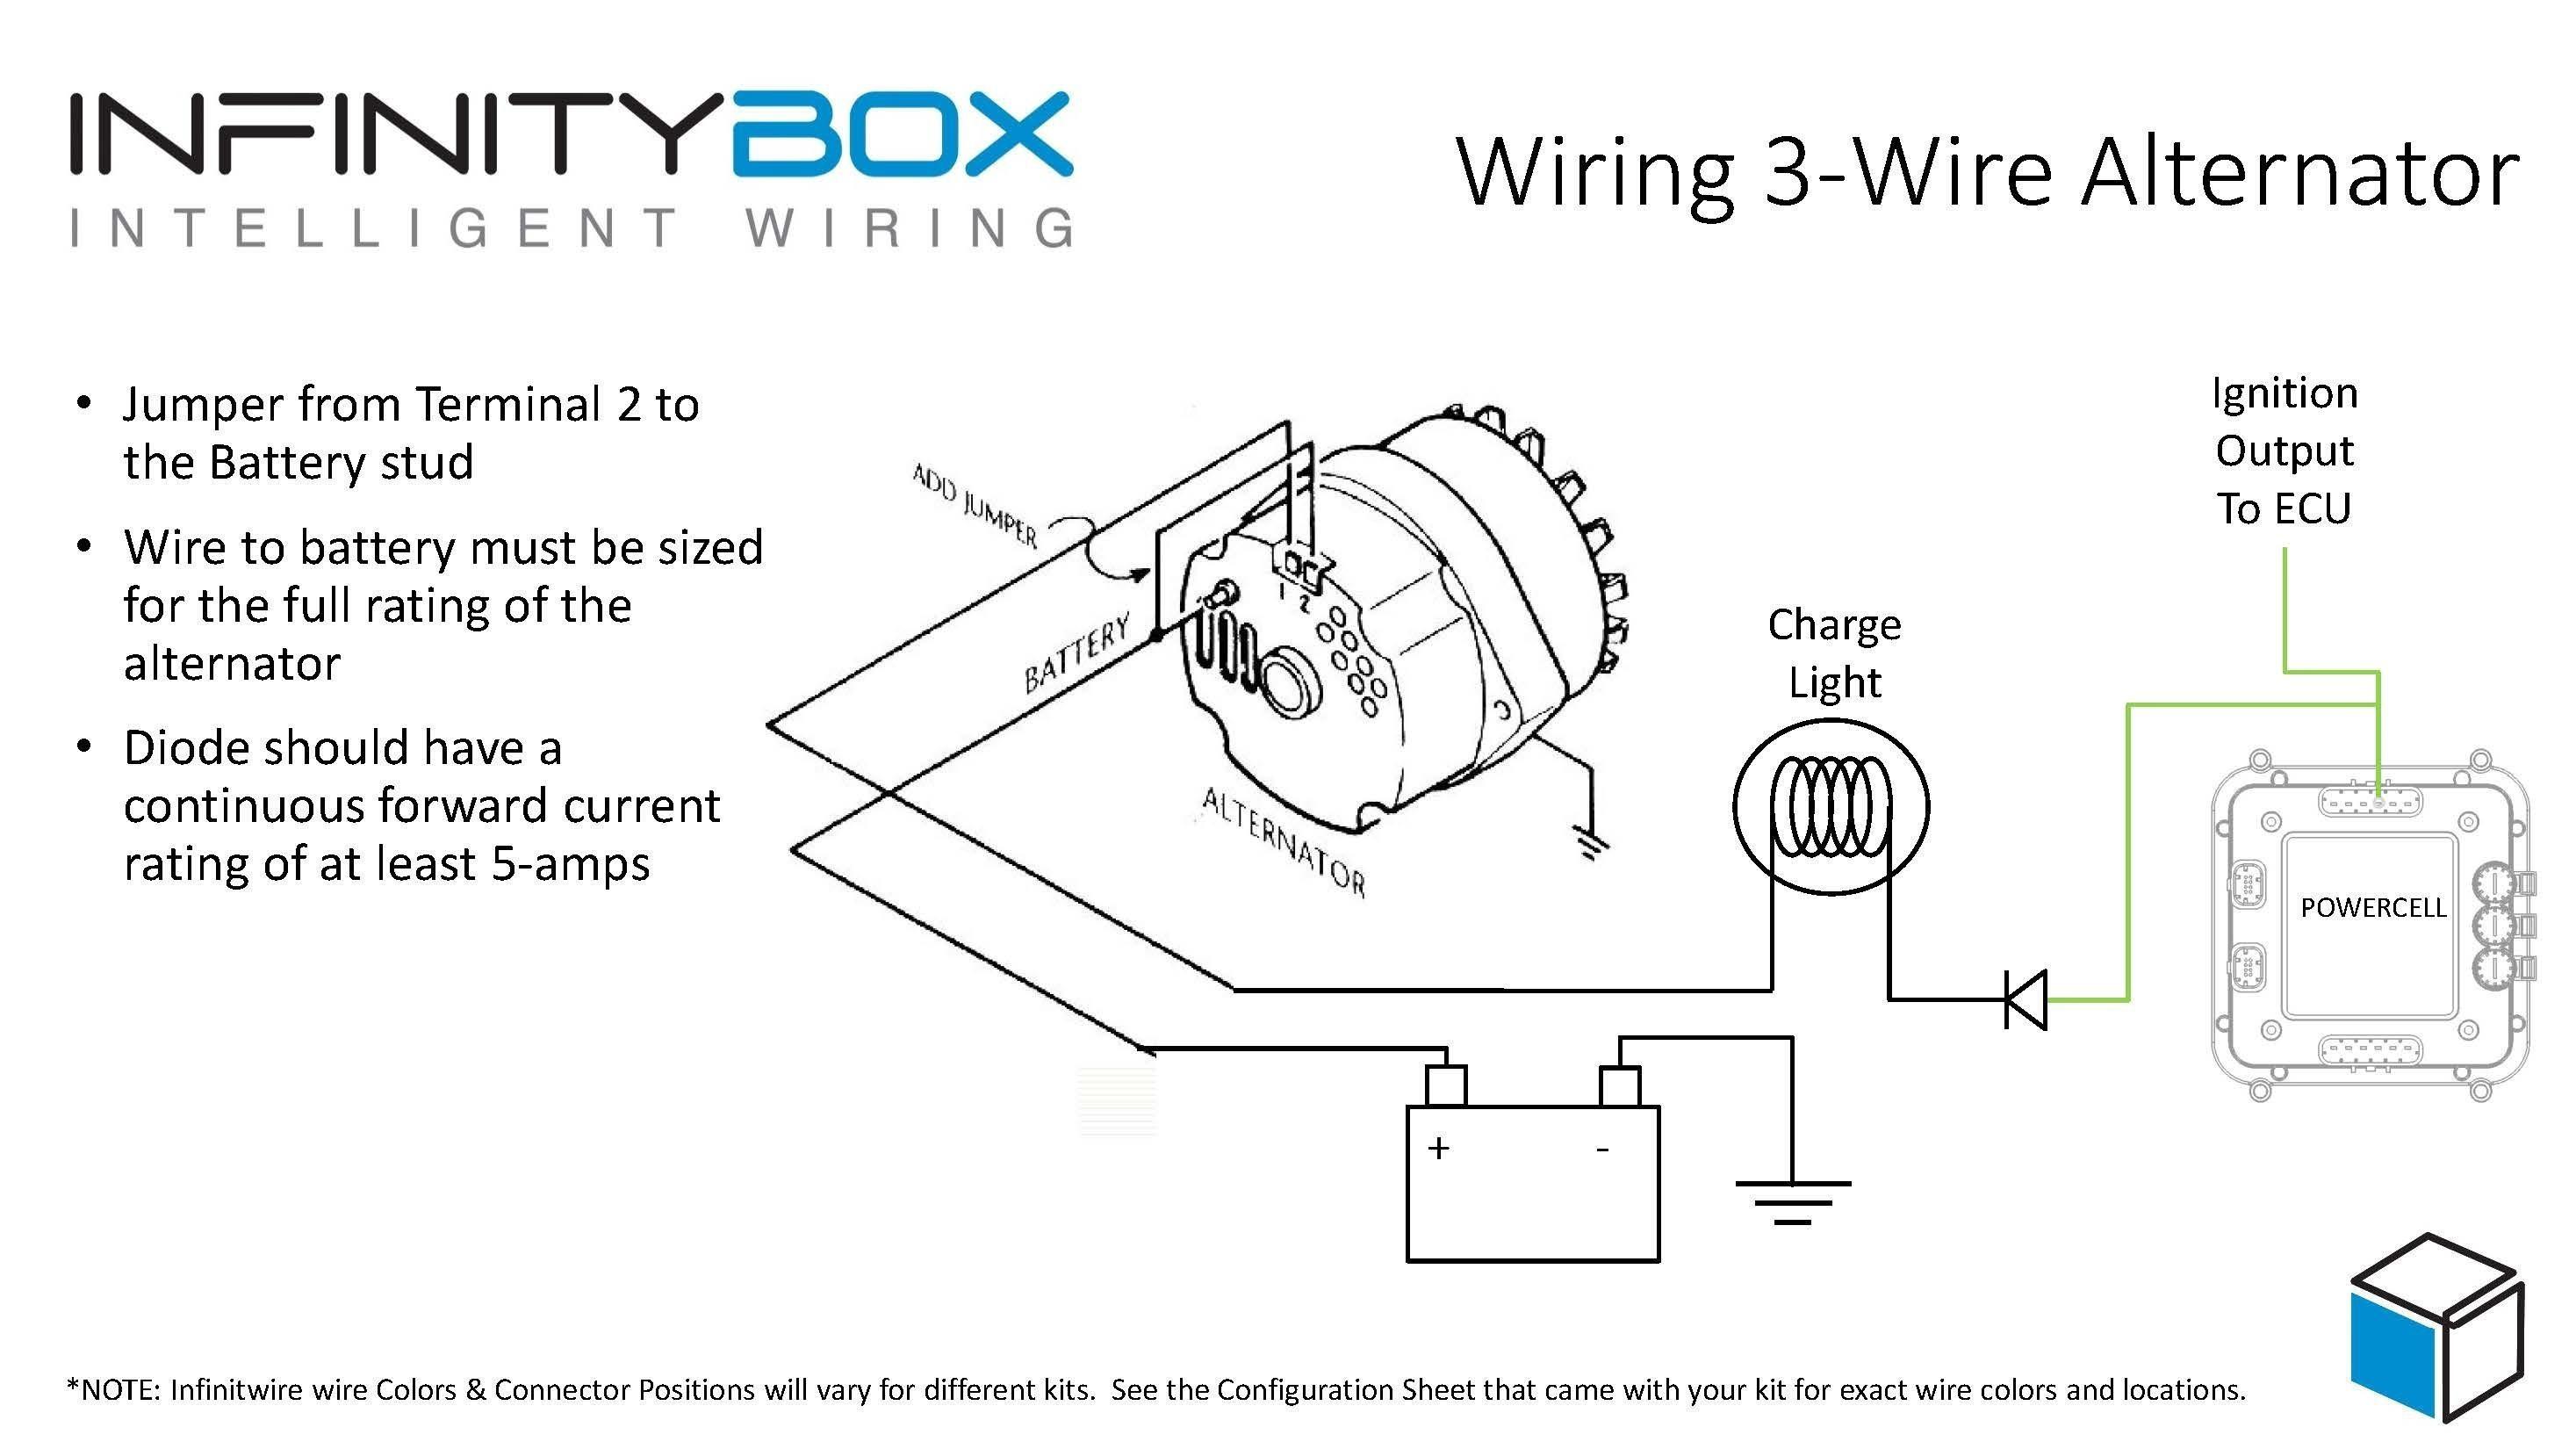 Audi Valeo Wiring Diagram -2003 Ford Explorer Fuel Pump Wiring Diagram |  Begeboy Wiring Diagram Source | Audi Valeo Wiring Diagram |  | Begeboy Wiring Diagram Source